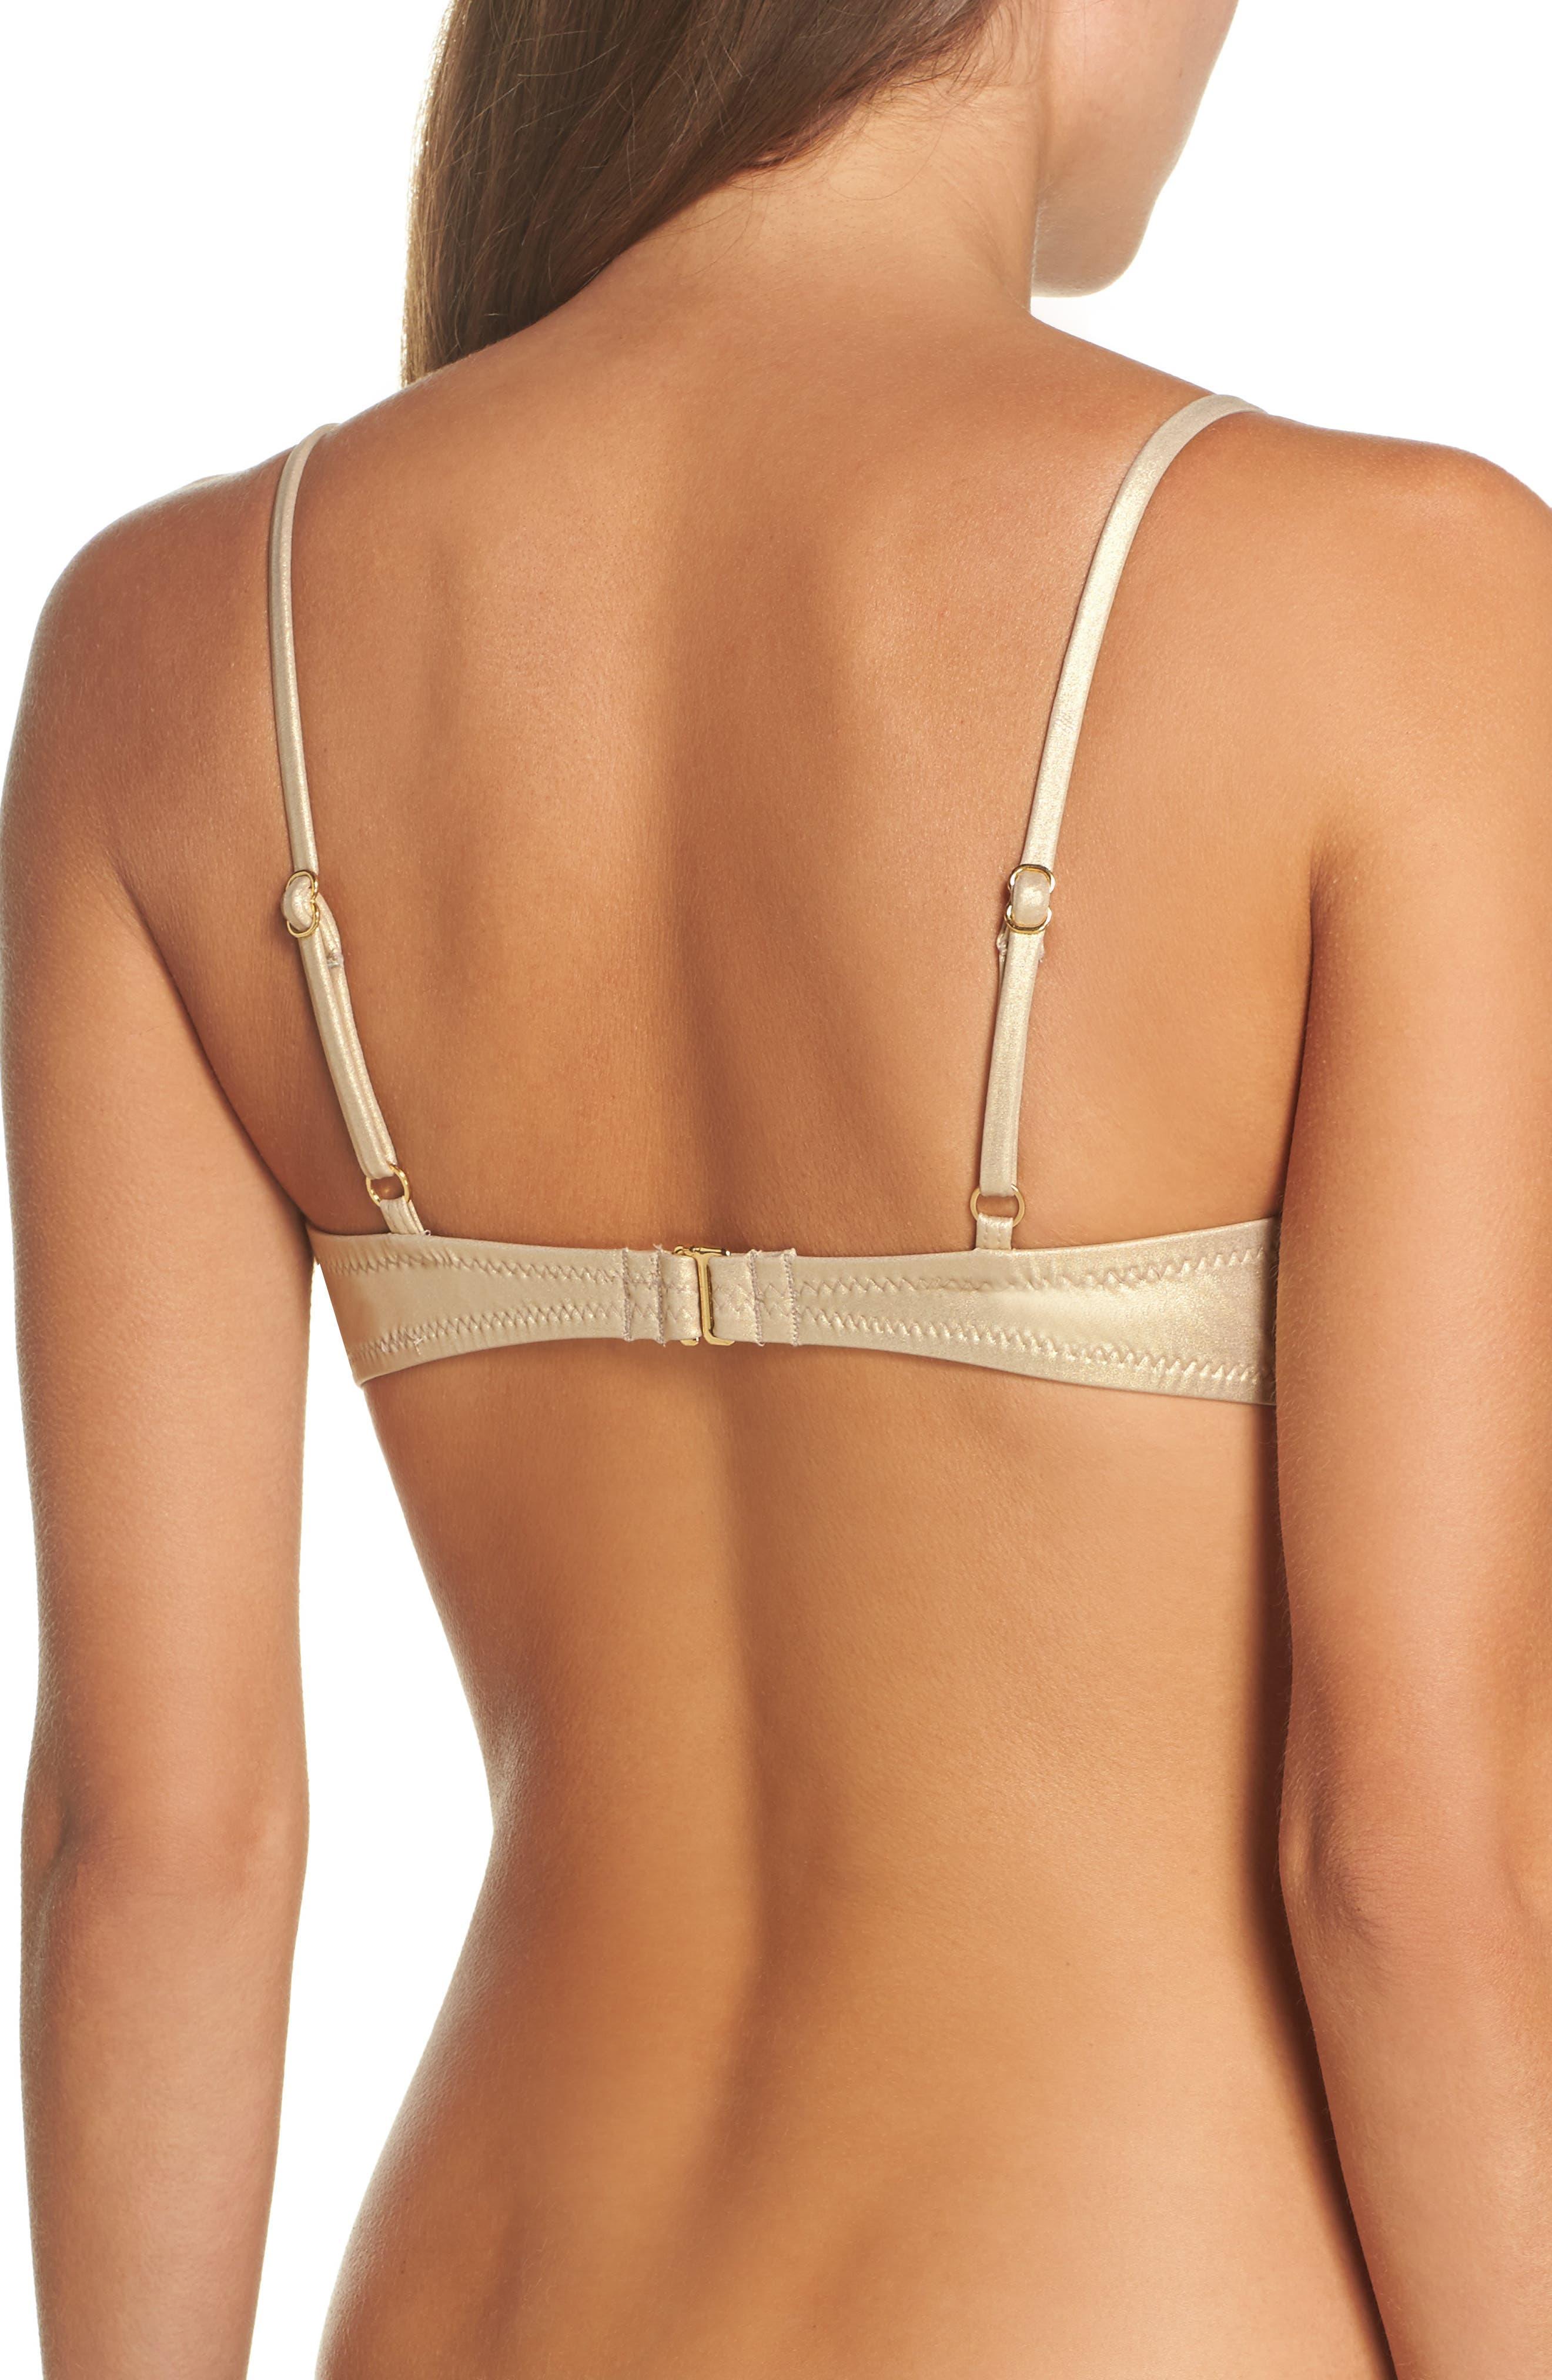 Golden Medallion Bikini Top,                             Alternate thumbnail 2, color,                             710